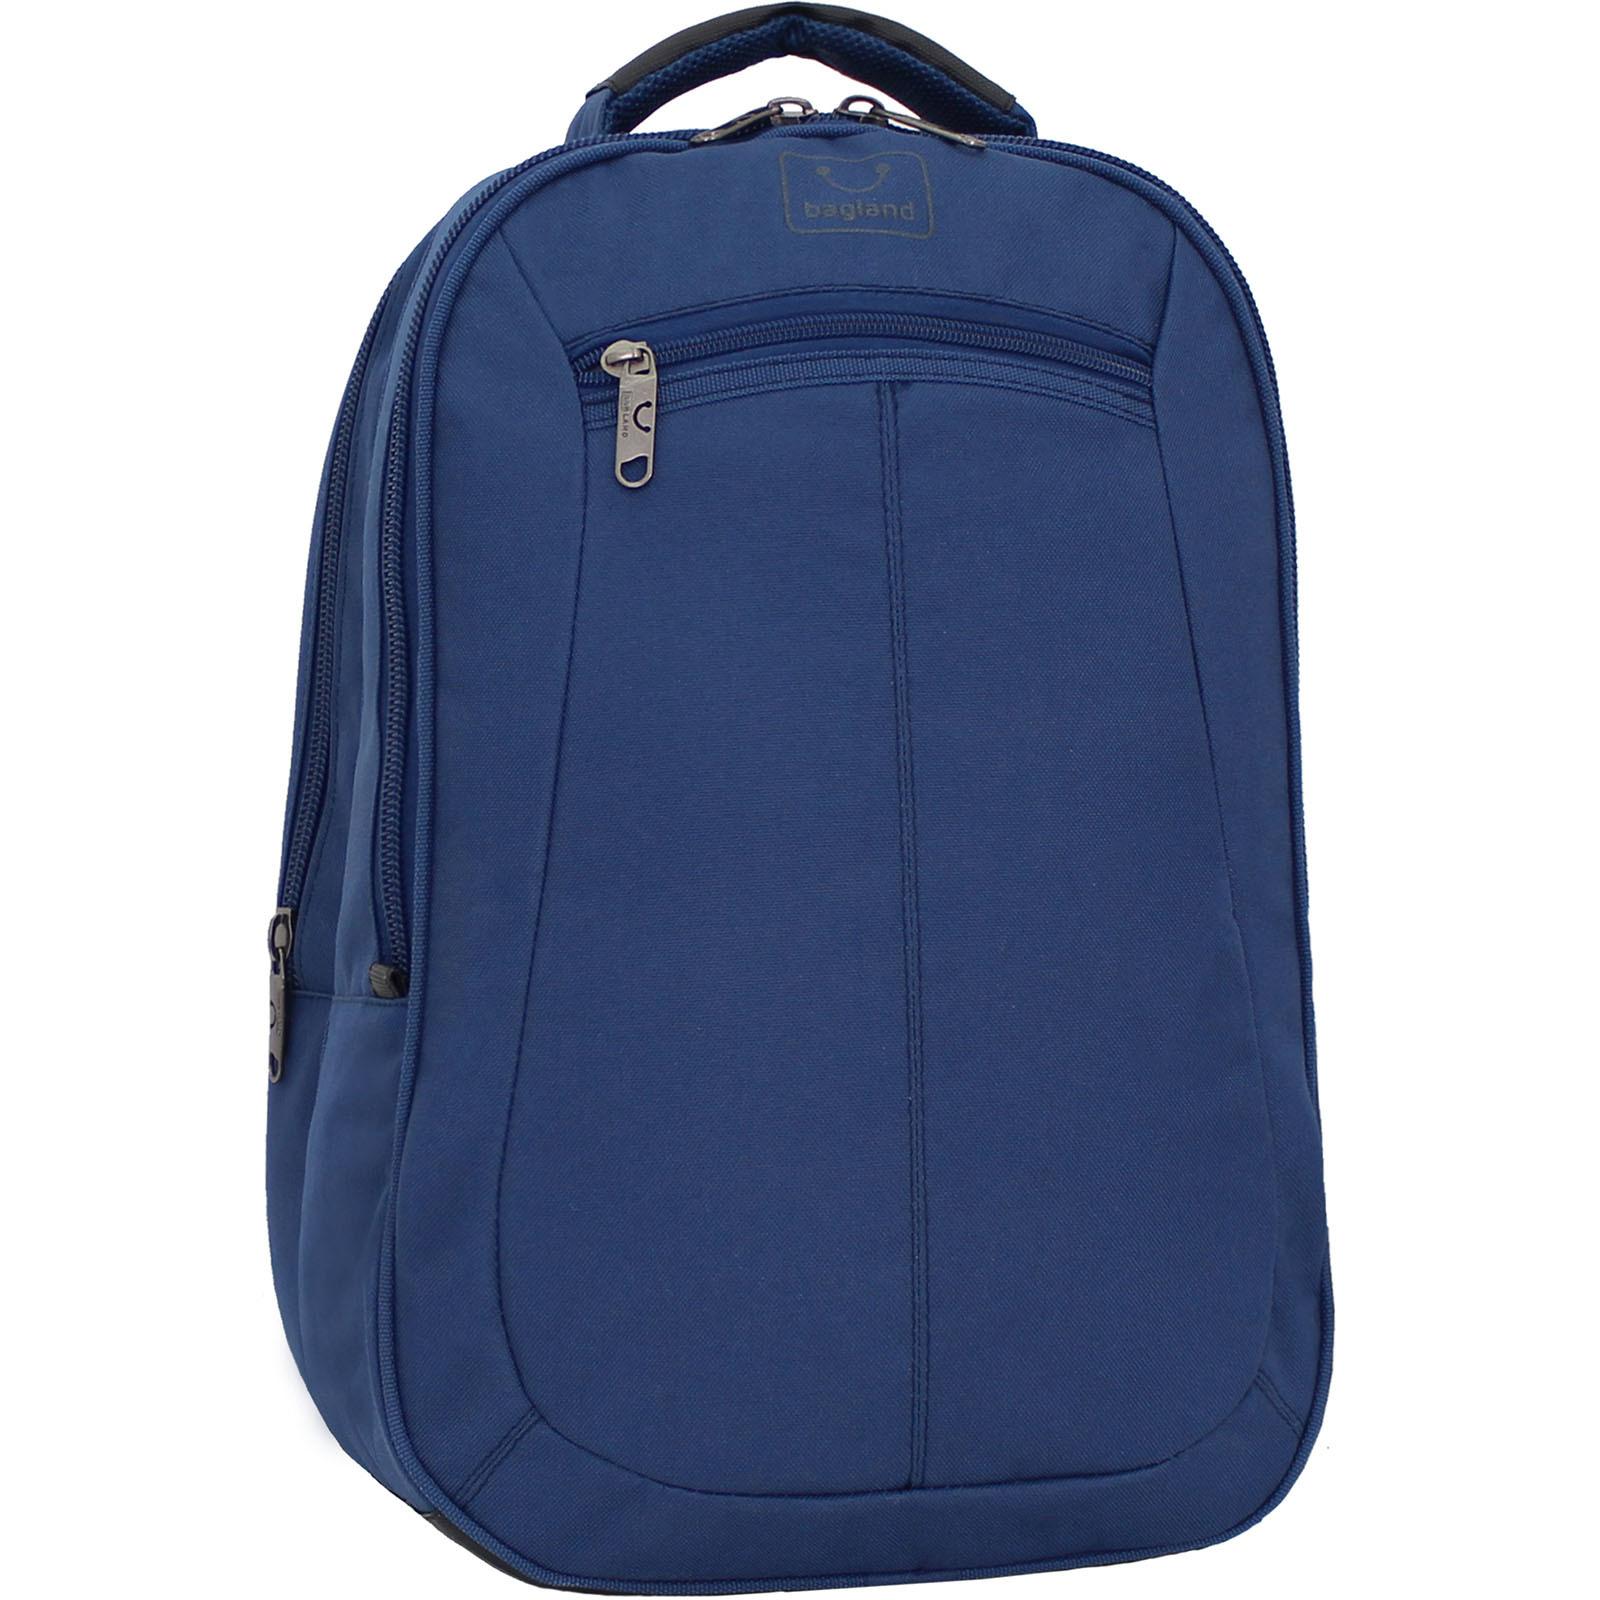 Рюкзаки для ноутбука Рюкзак для ноутбука Bagland Рюкзак под ноутбук 536 22 л. Синий (0053666) IMG_9924.JPG